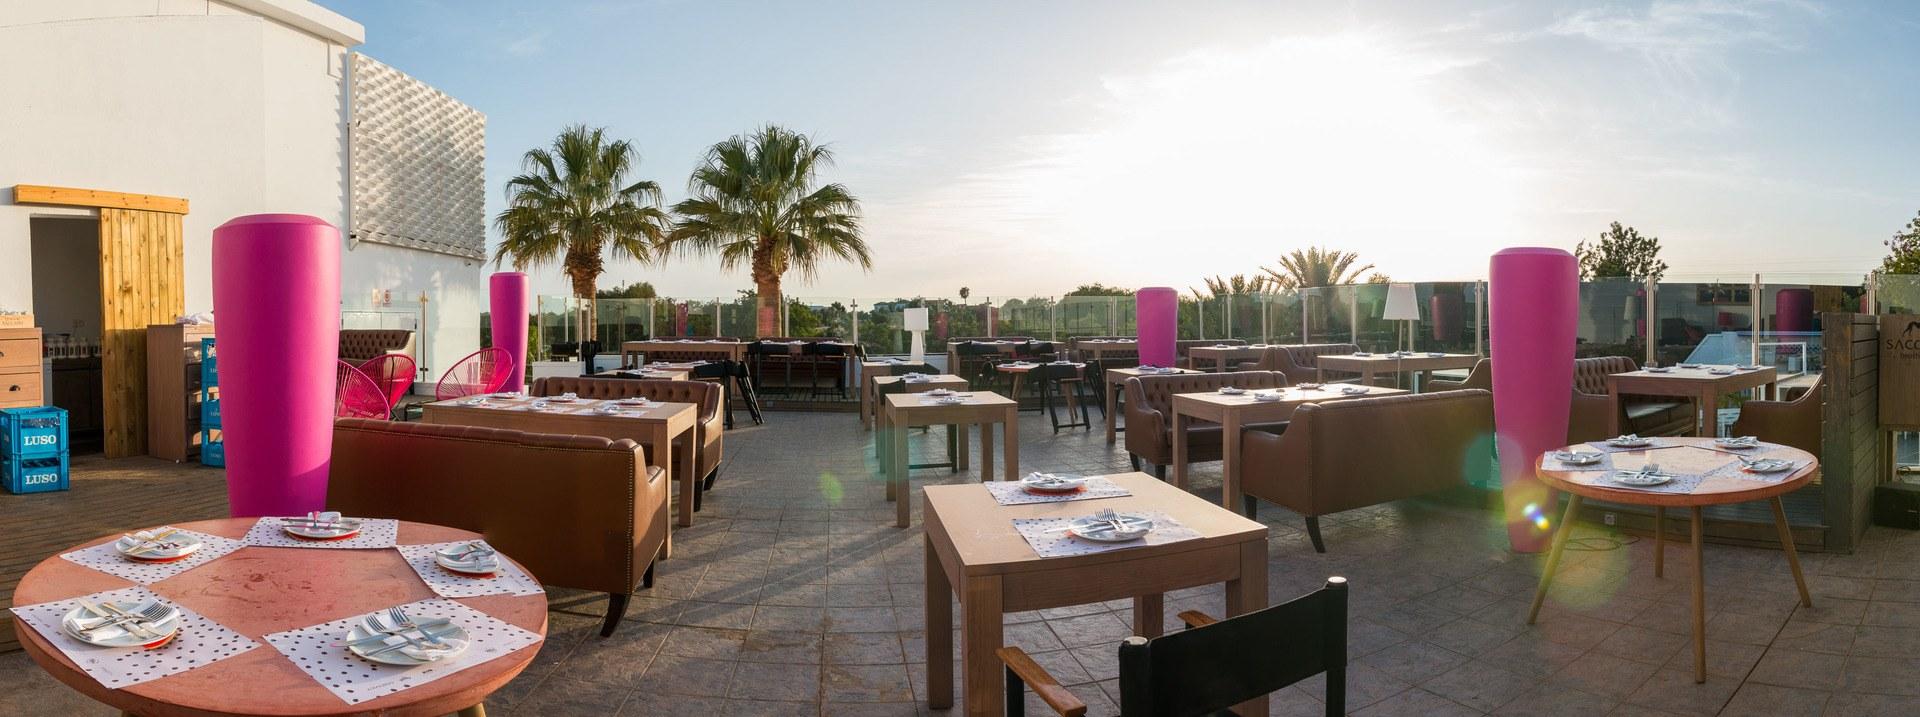 nightclub venue in the Algarve